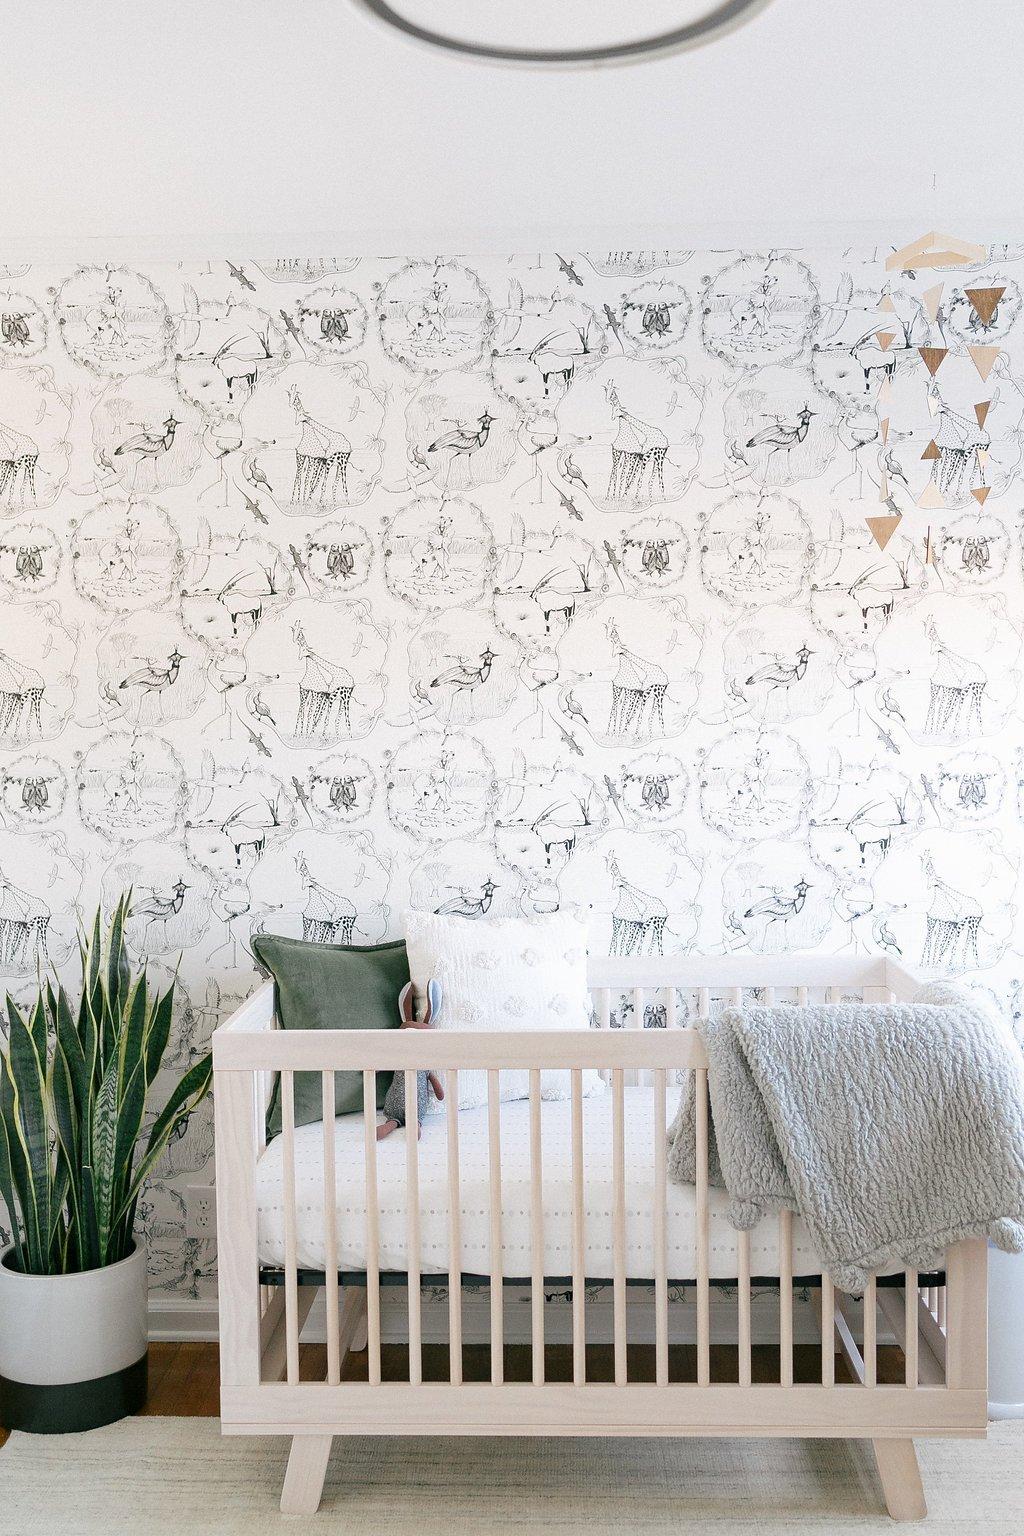 Nursery with animal wallpaper